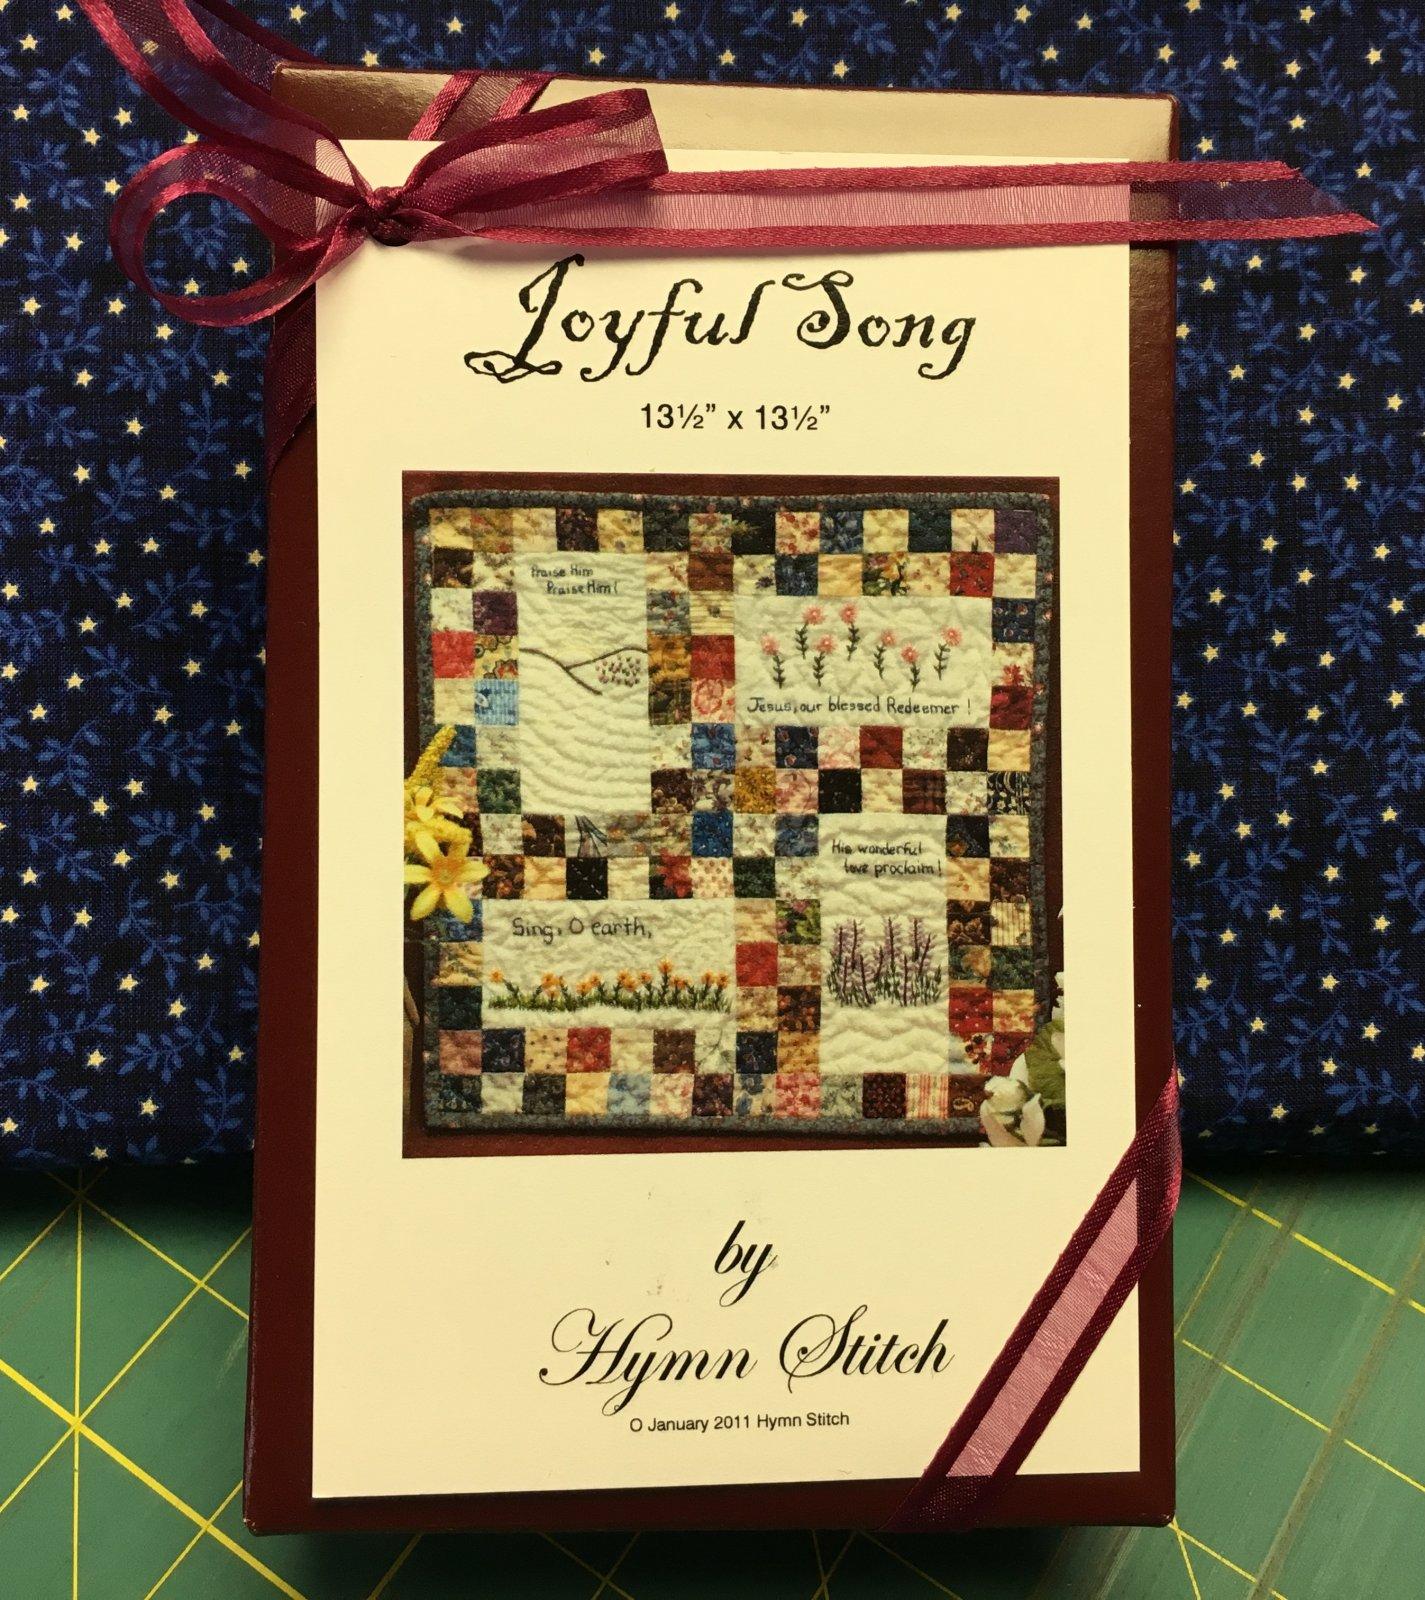 Hymn Stitch; Joyful Song kit